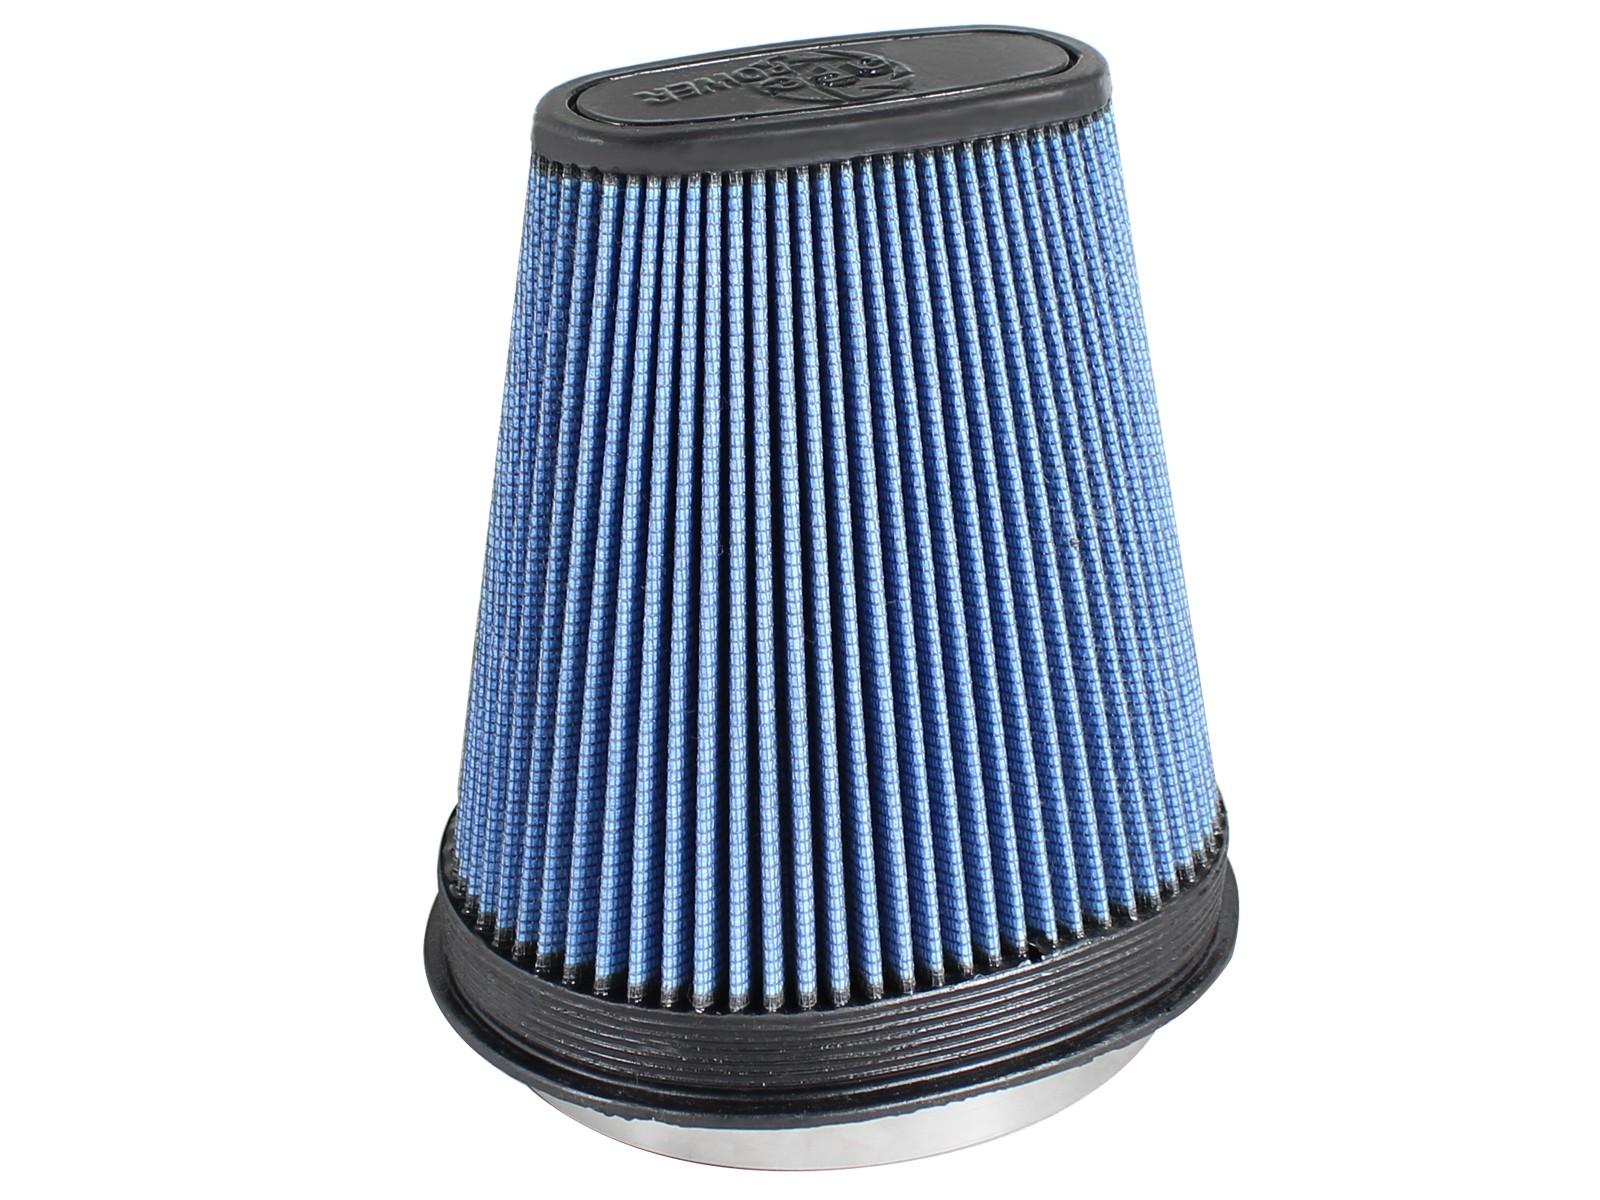 aFe POWER 24-90080 Magnum FLOW Pro 5R Air Filter